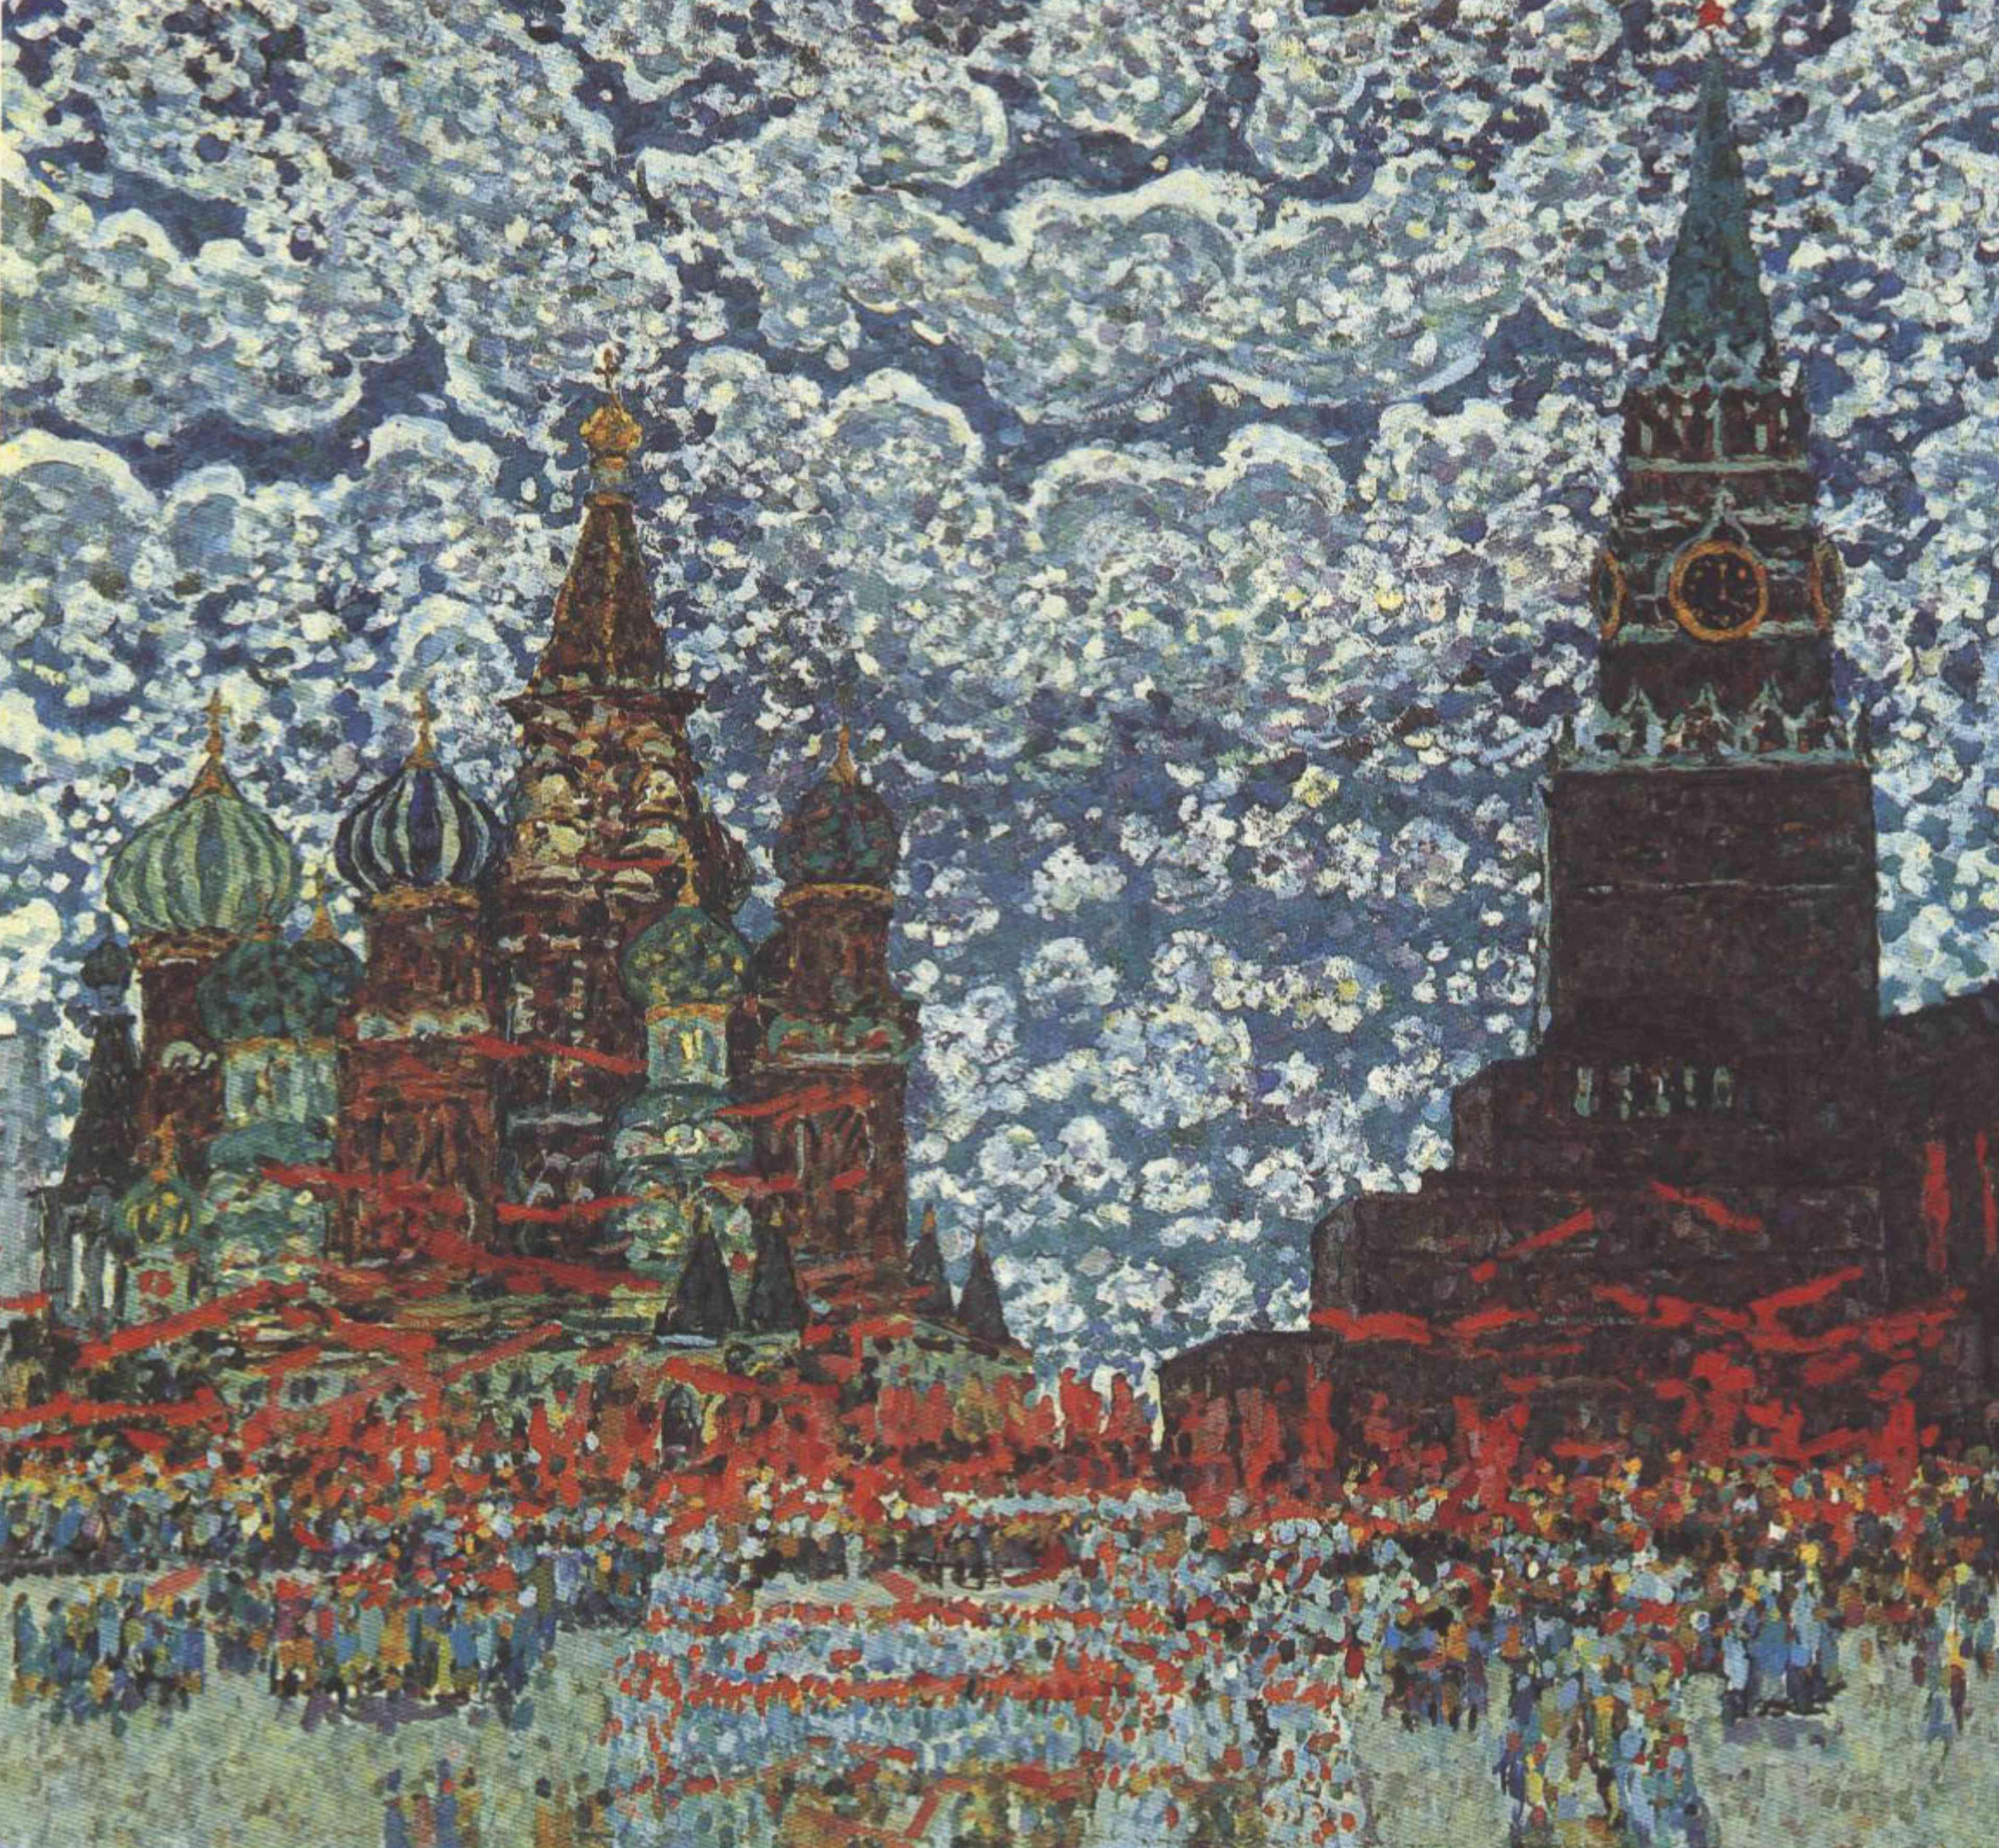 http://babanata.ru/wp-content/uploads/2013/03/domachnikov.jpg height=960 height=601